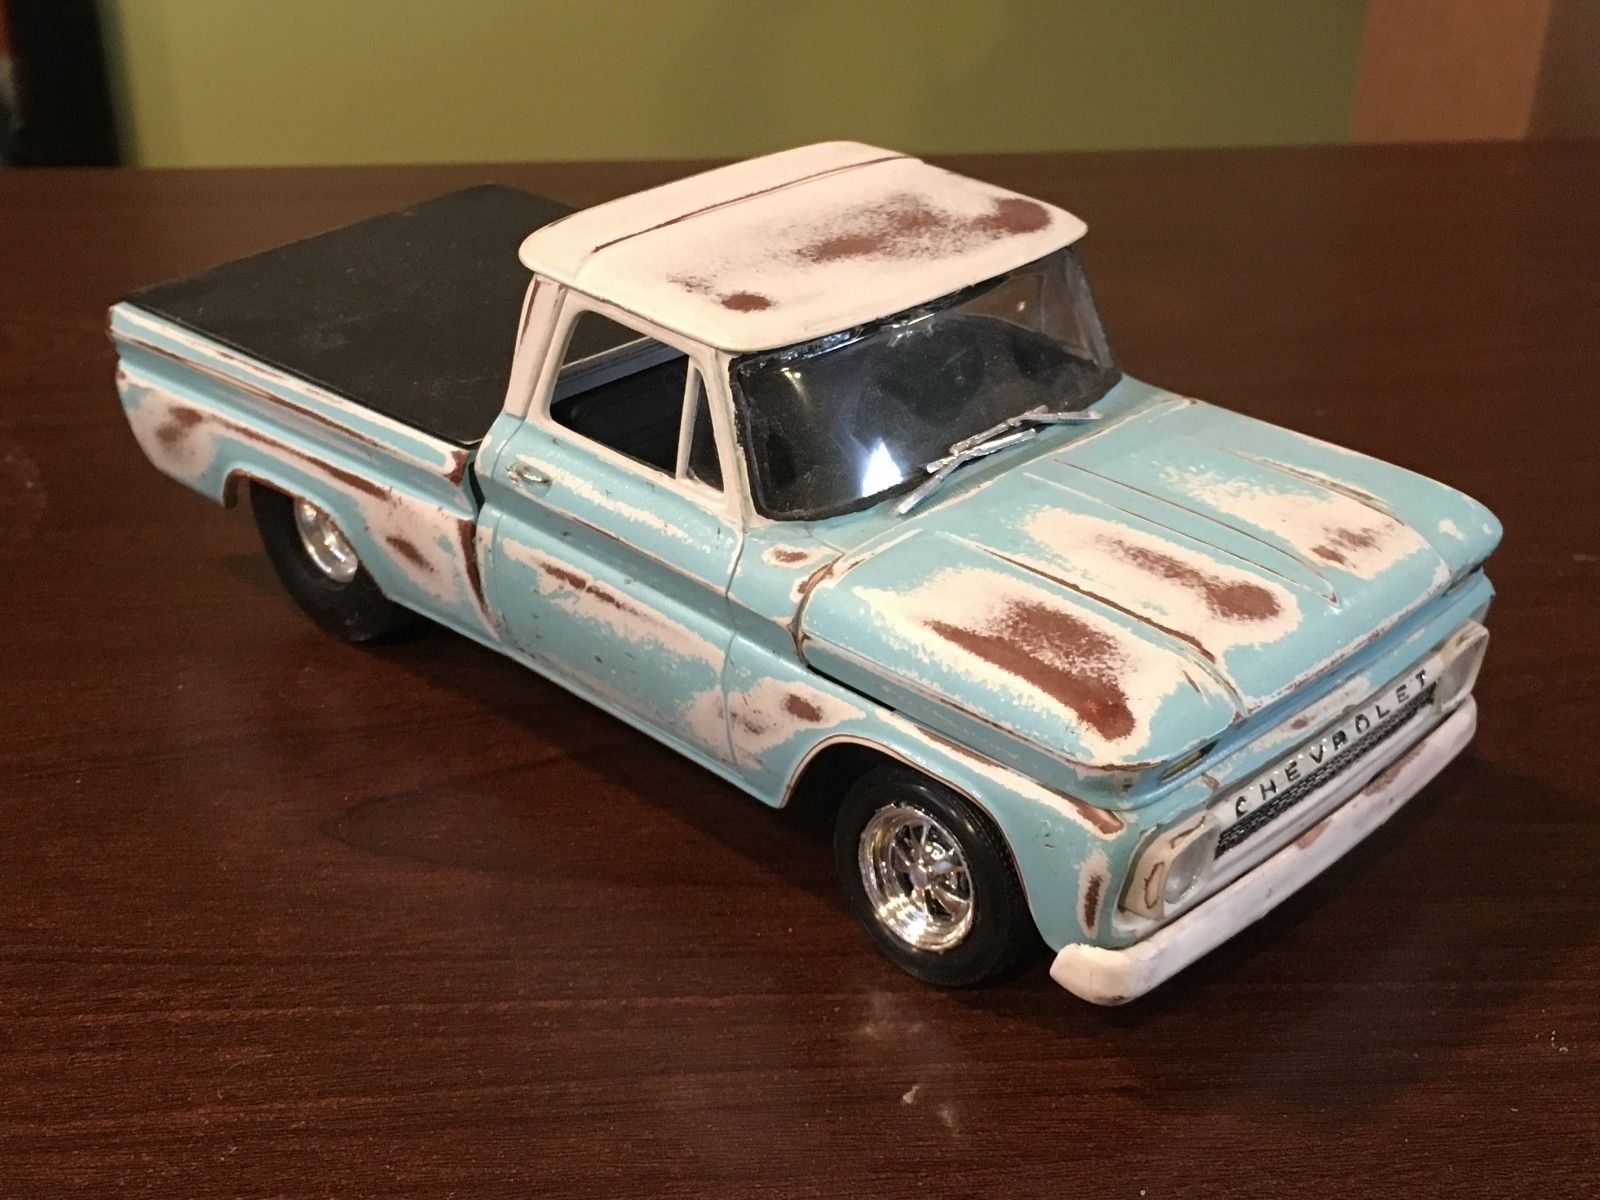 1964 CHEVY FLEETSIDE PICKUP TRUCK CAR MODEL KIT - rat rod - wreck ...